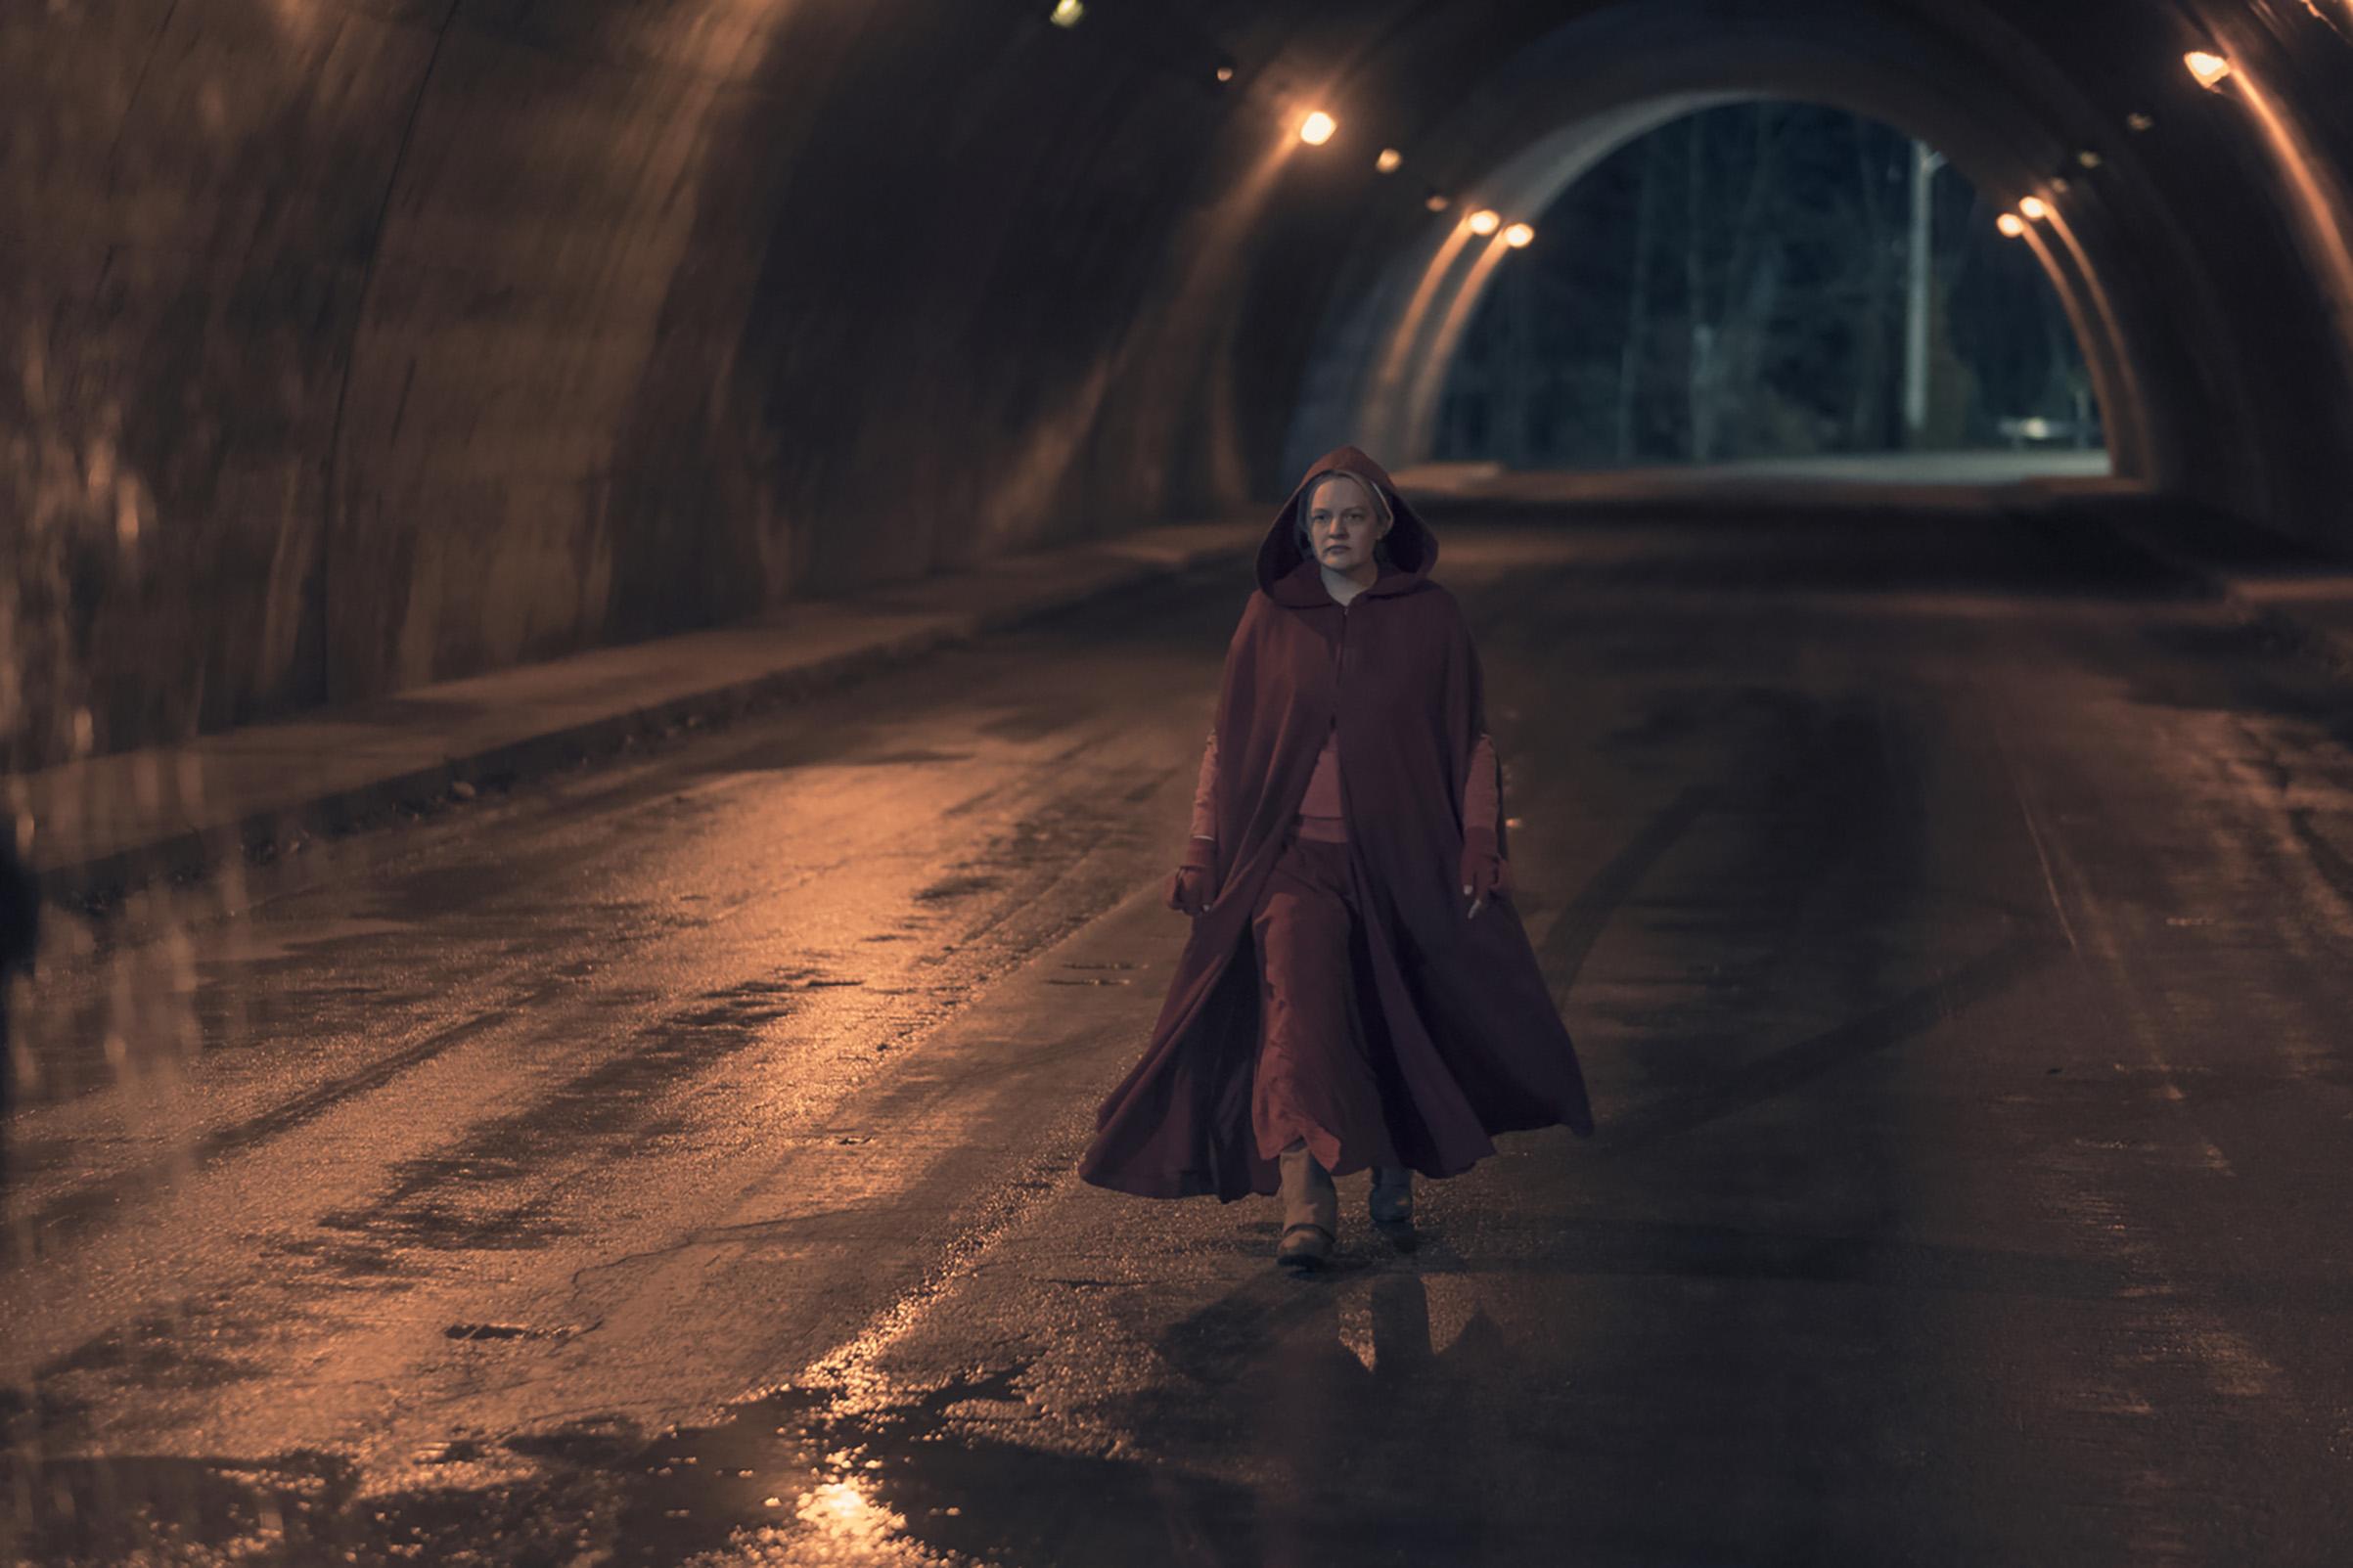 Elisabeth Moss as June Osborne in 'The Handmaid's Tale'.